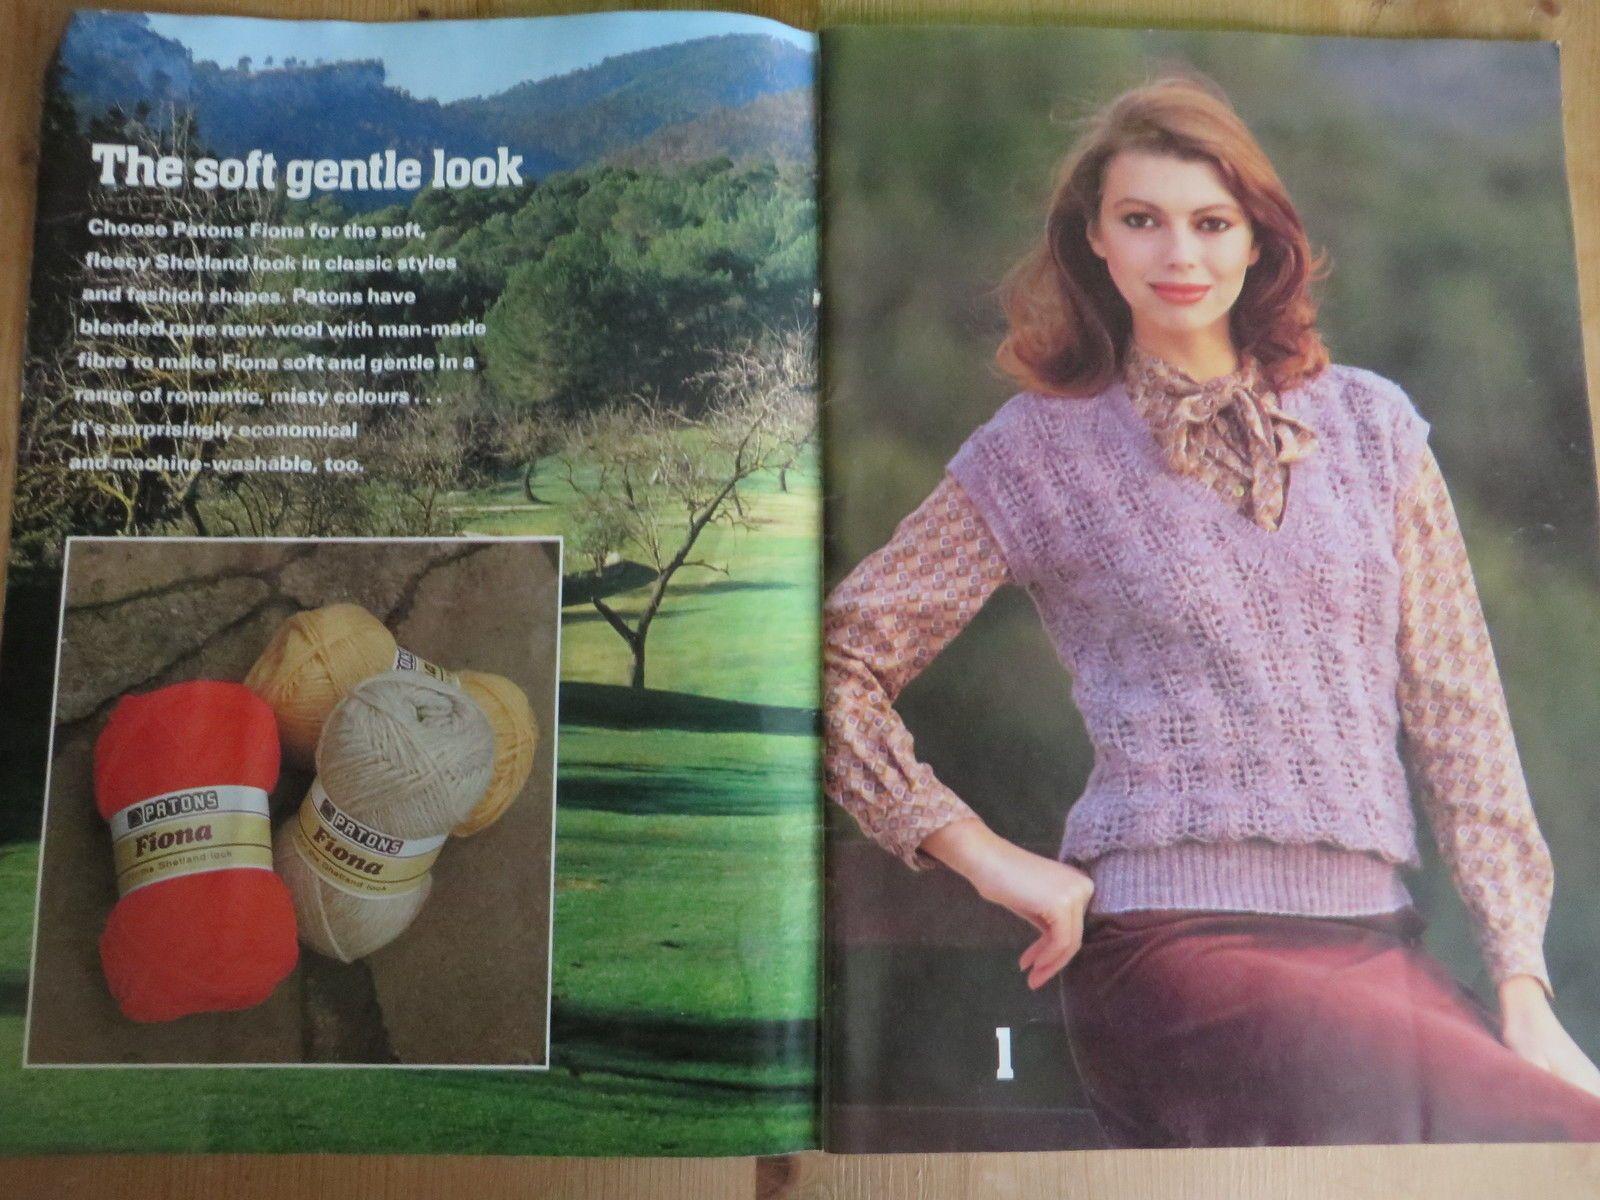 Vintage PATONS knitting pattern book 1980 Shetland Look Waistcoats ...